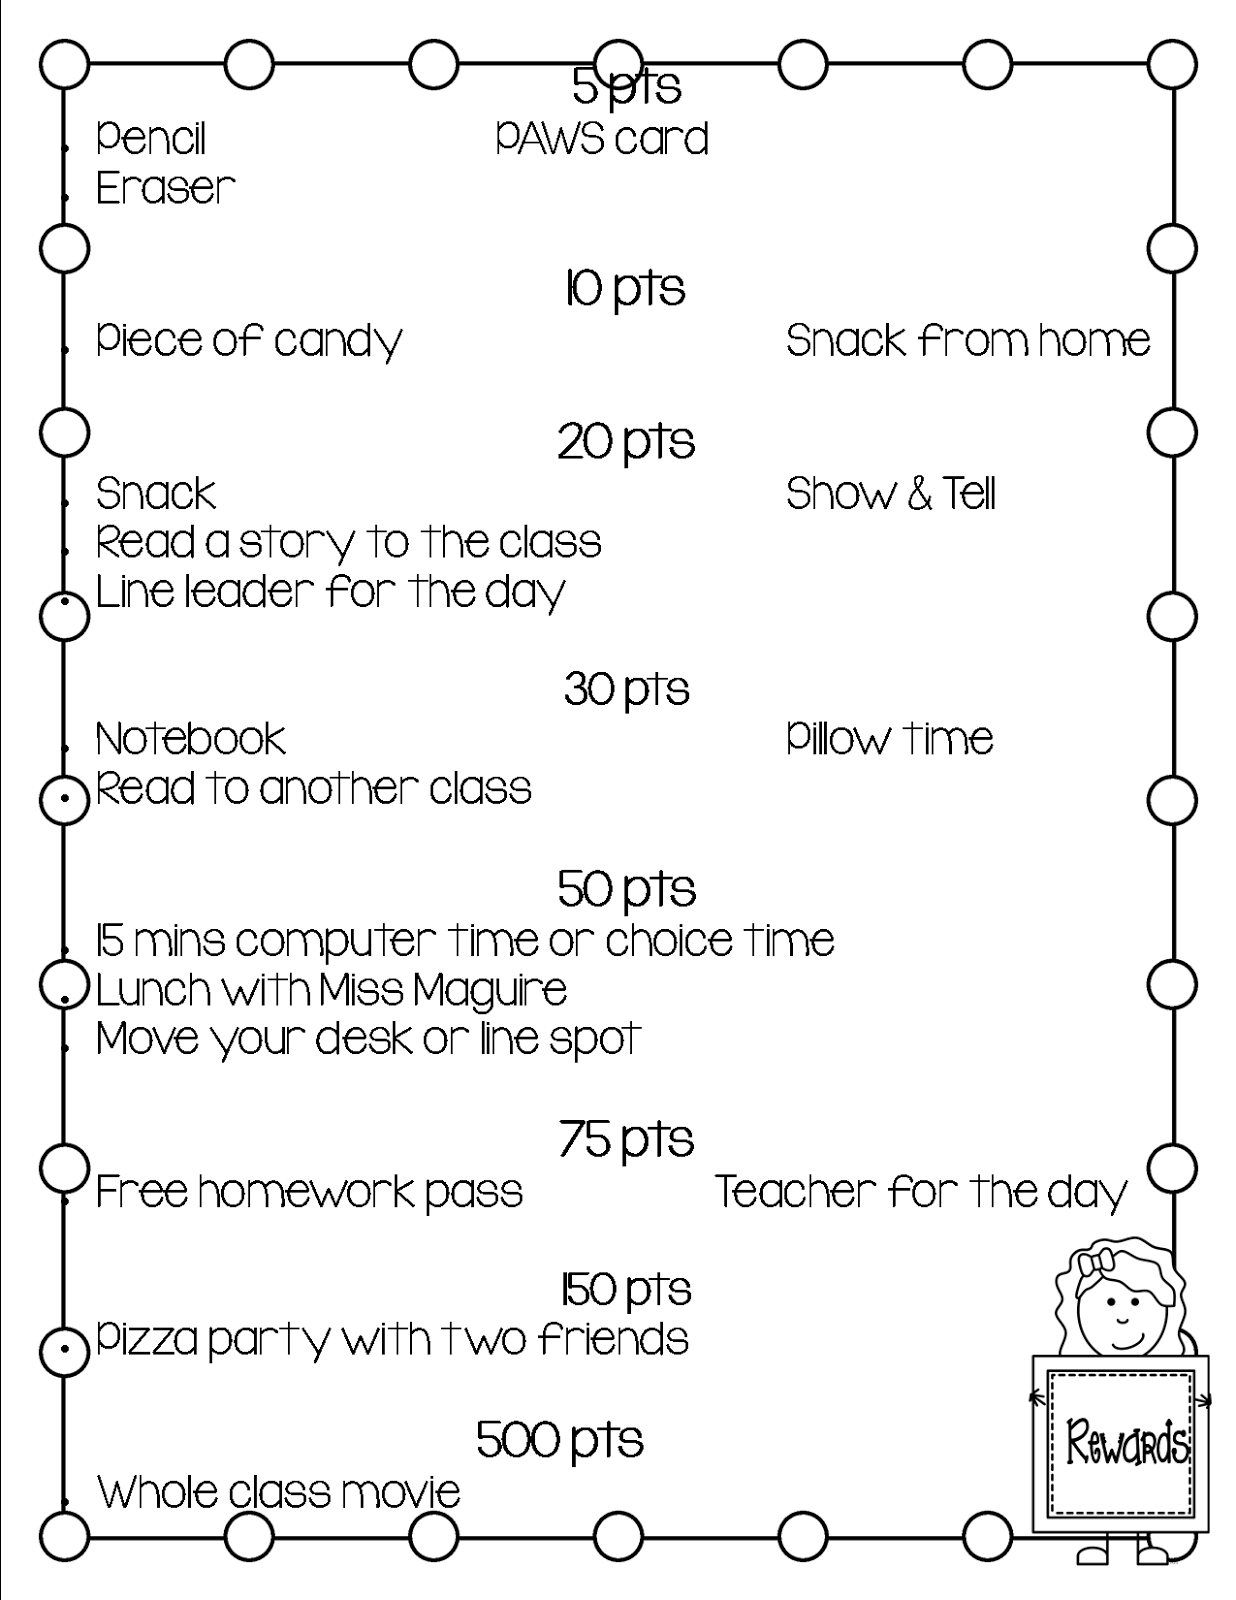 Classroom Reward Ideas High School : Using class dojo with a classroom economy system tales